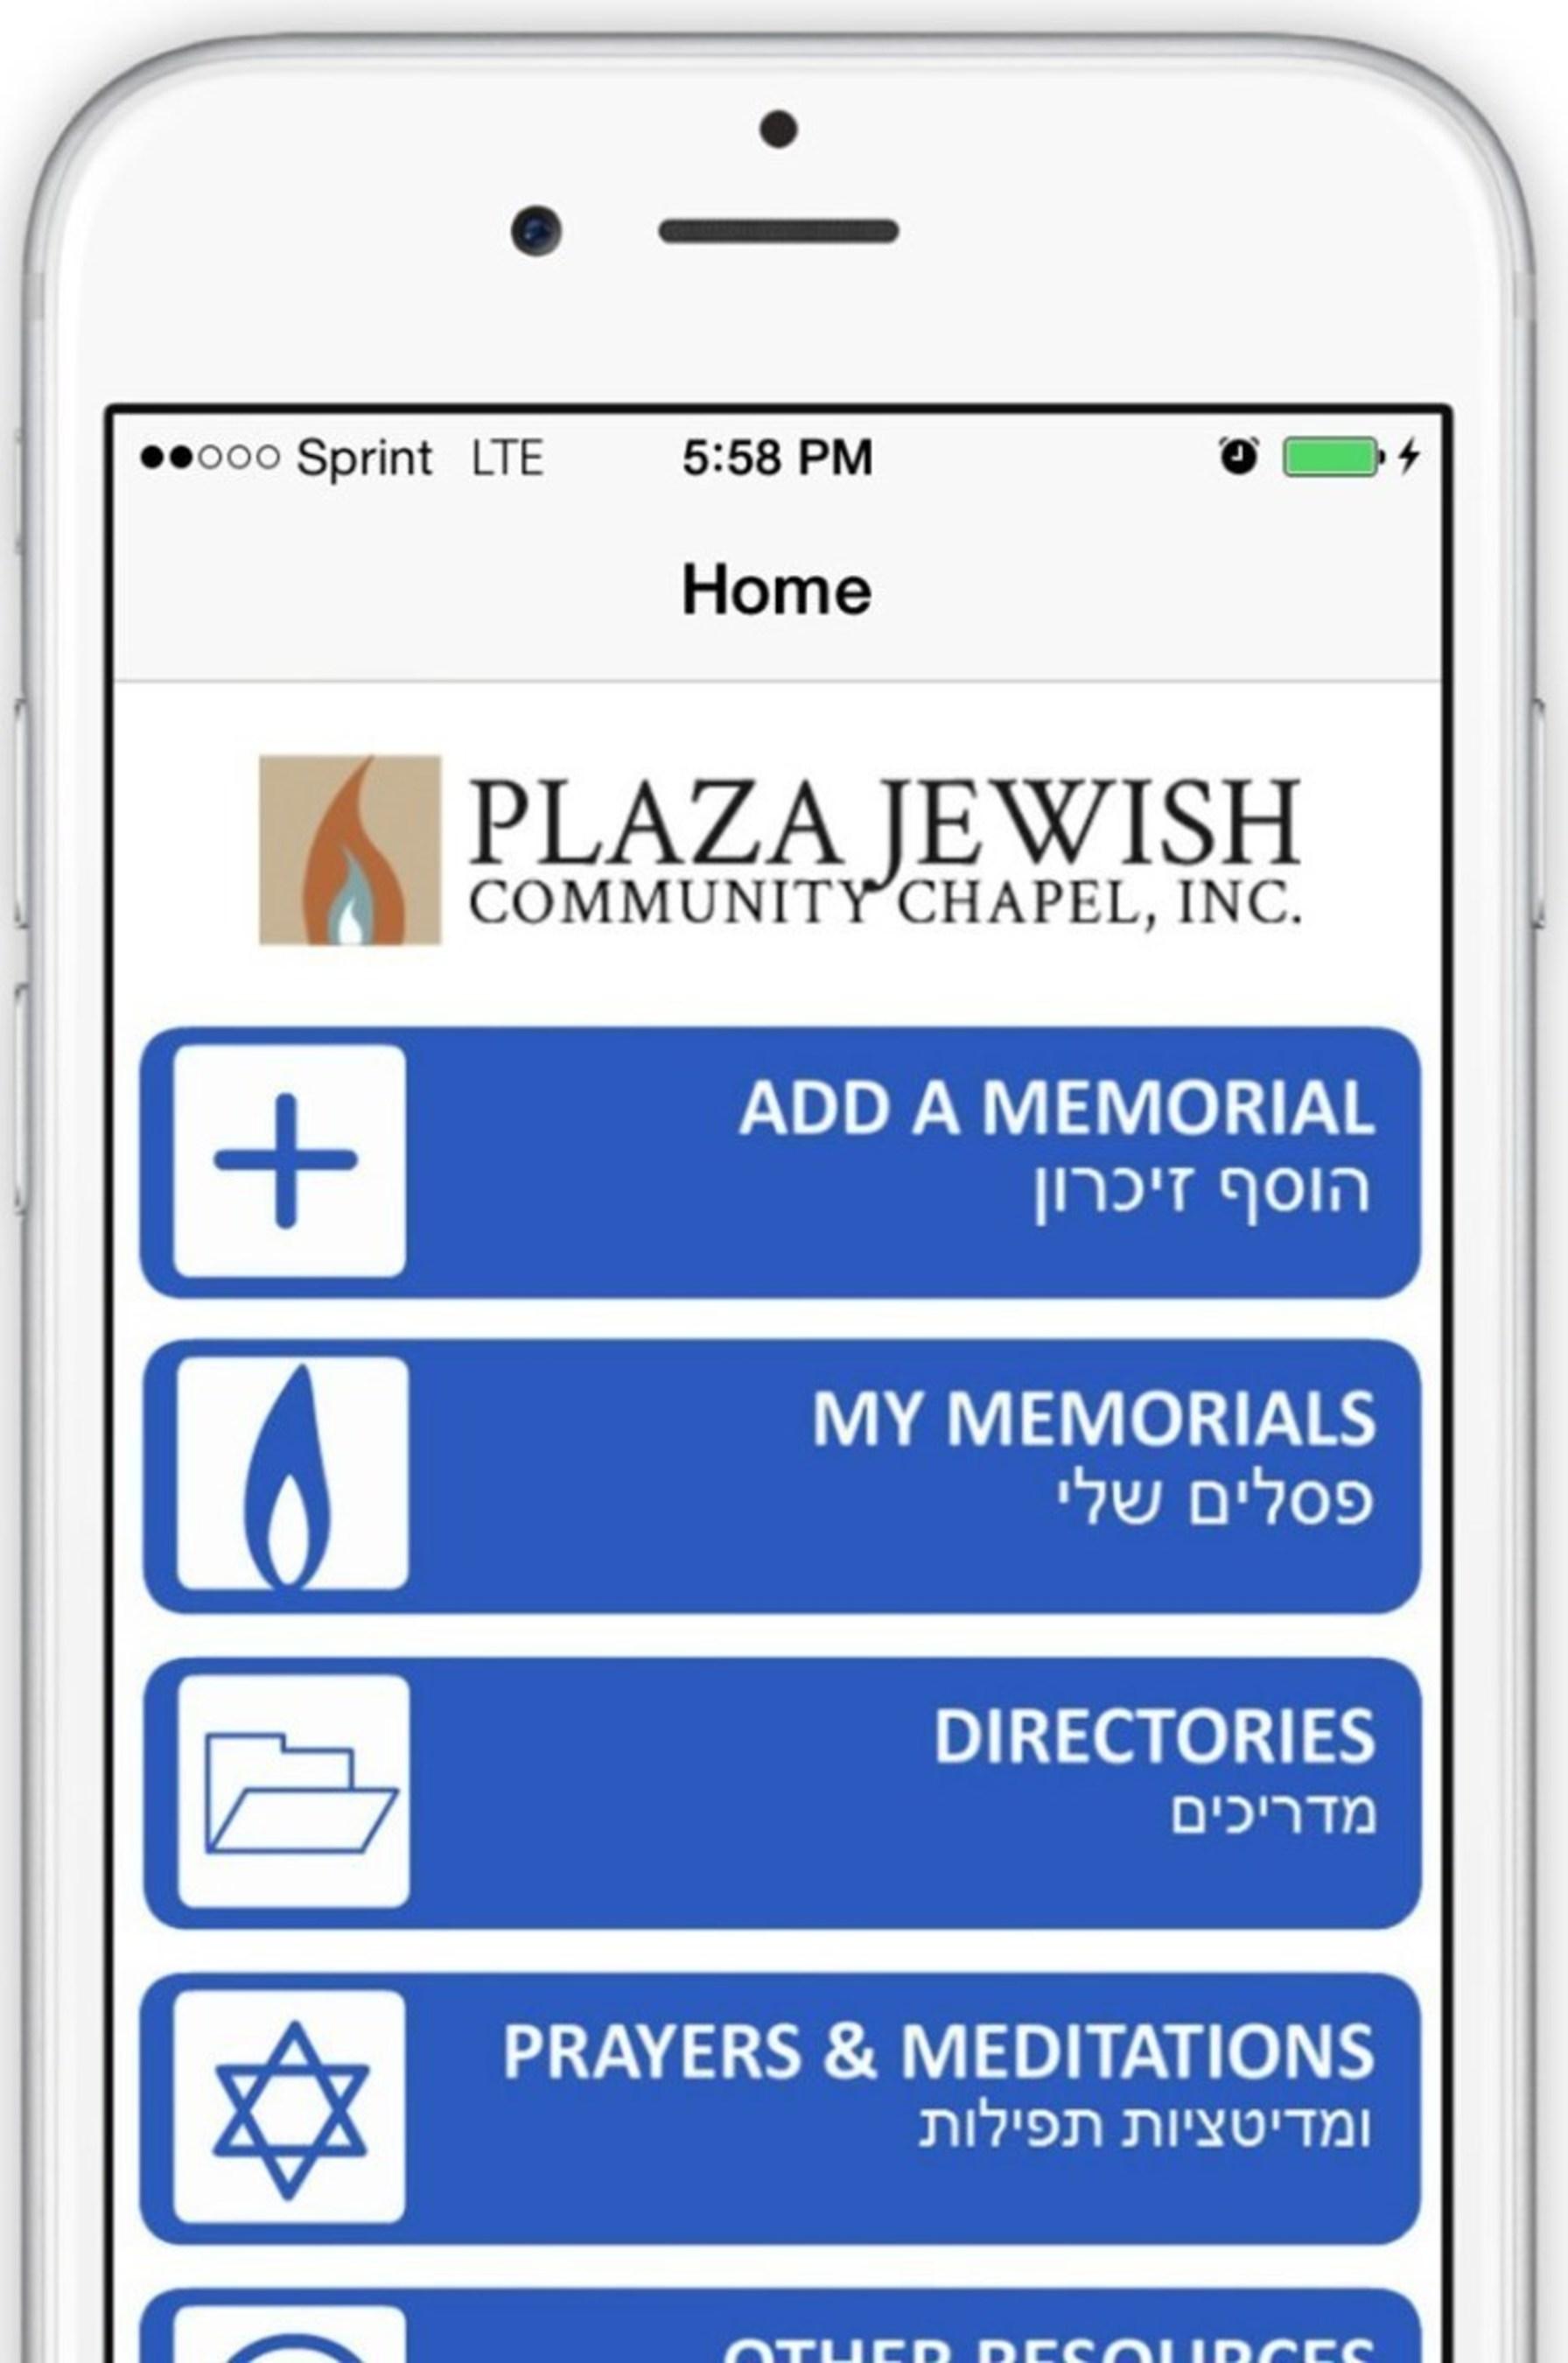 Plaza Jewish Community Chapel Launches Free 'Jewish Funeral and Yahrzeit Memorial App'